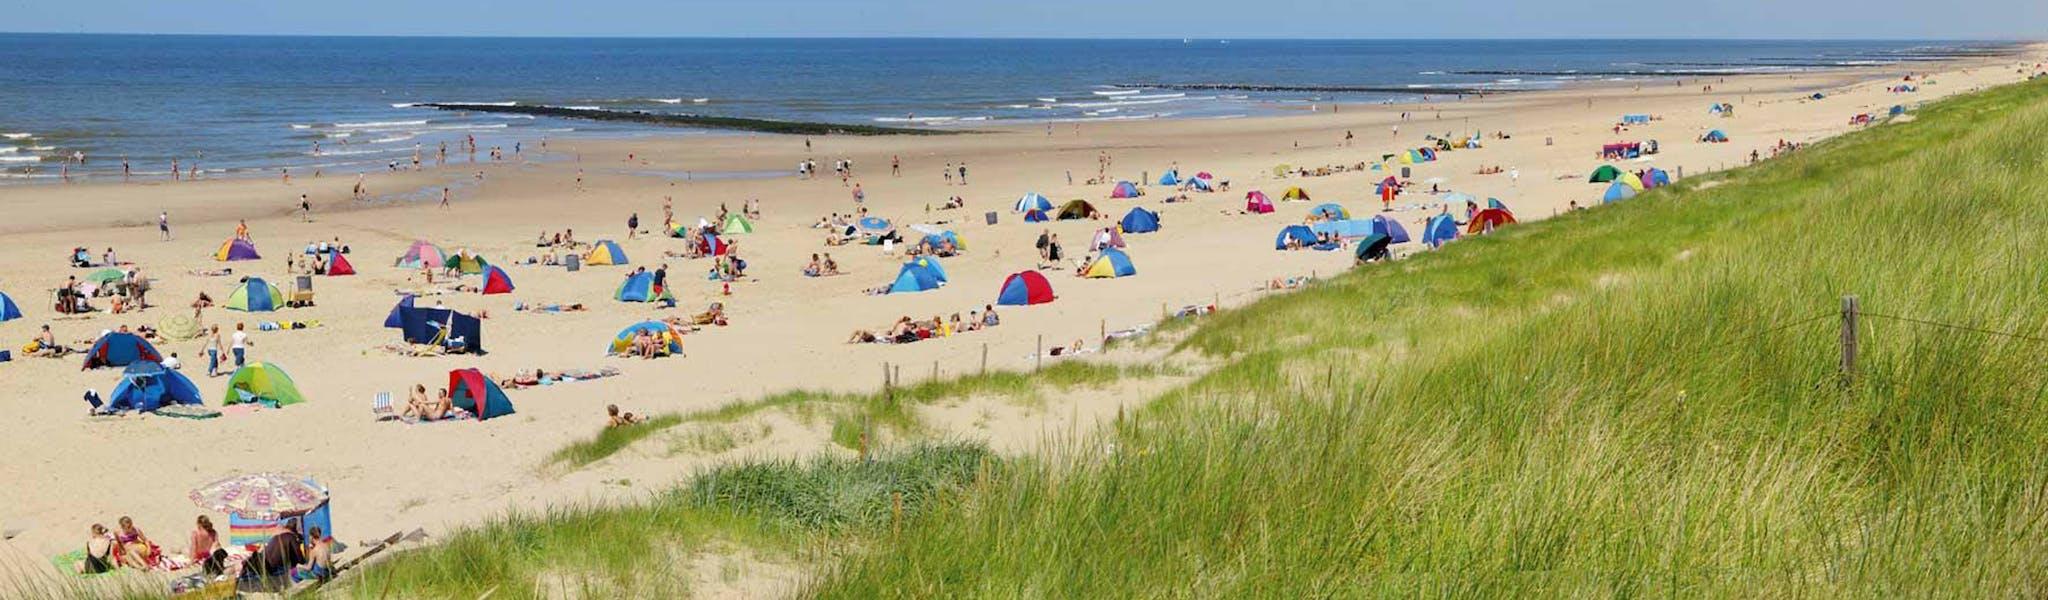 Camping Roompot Callassande strand